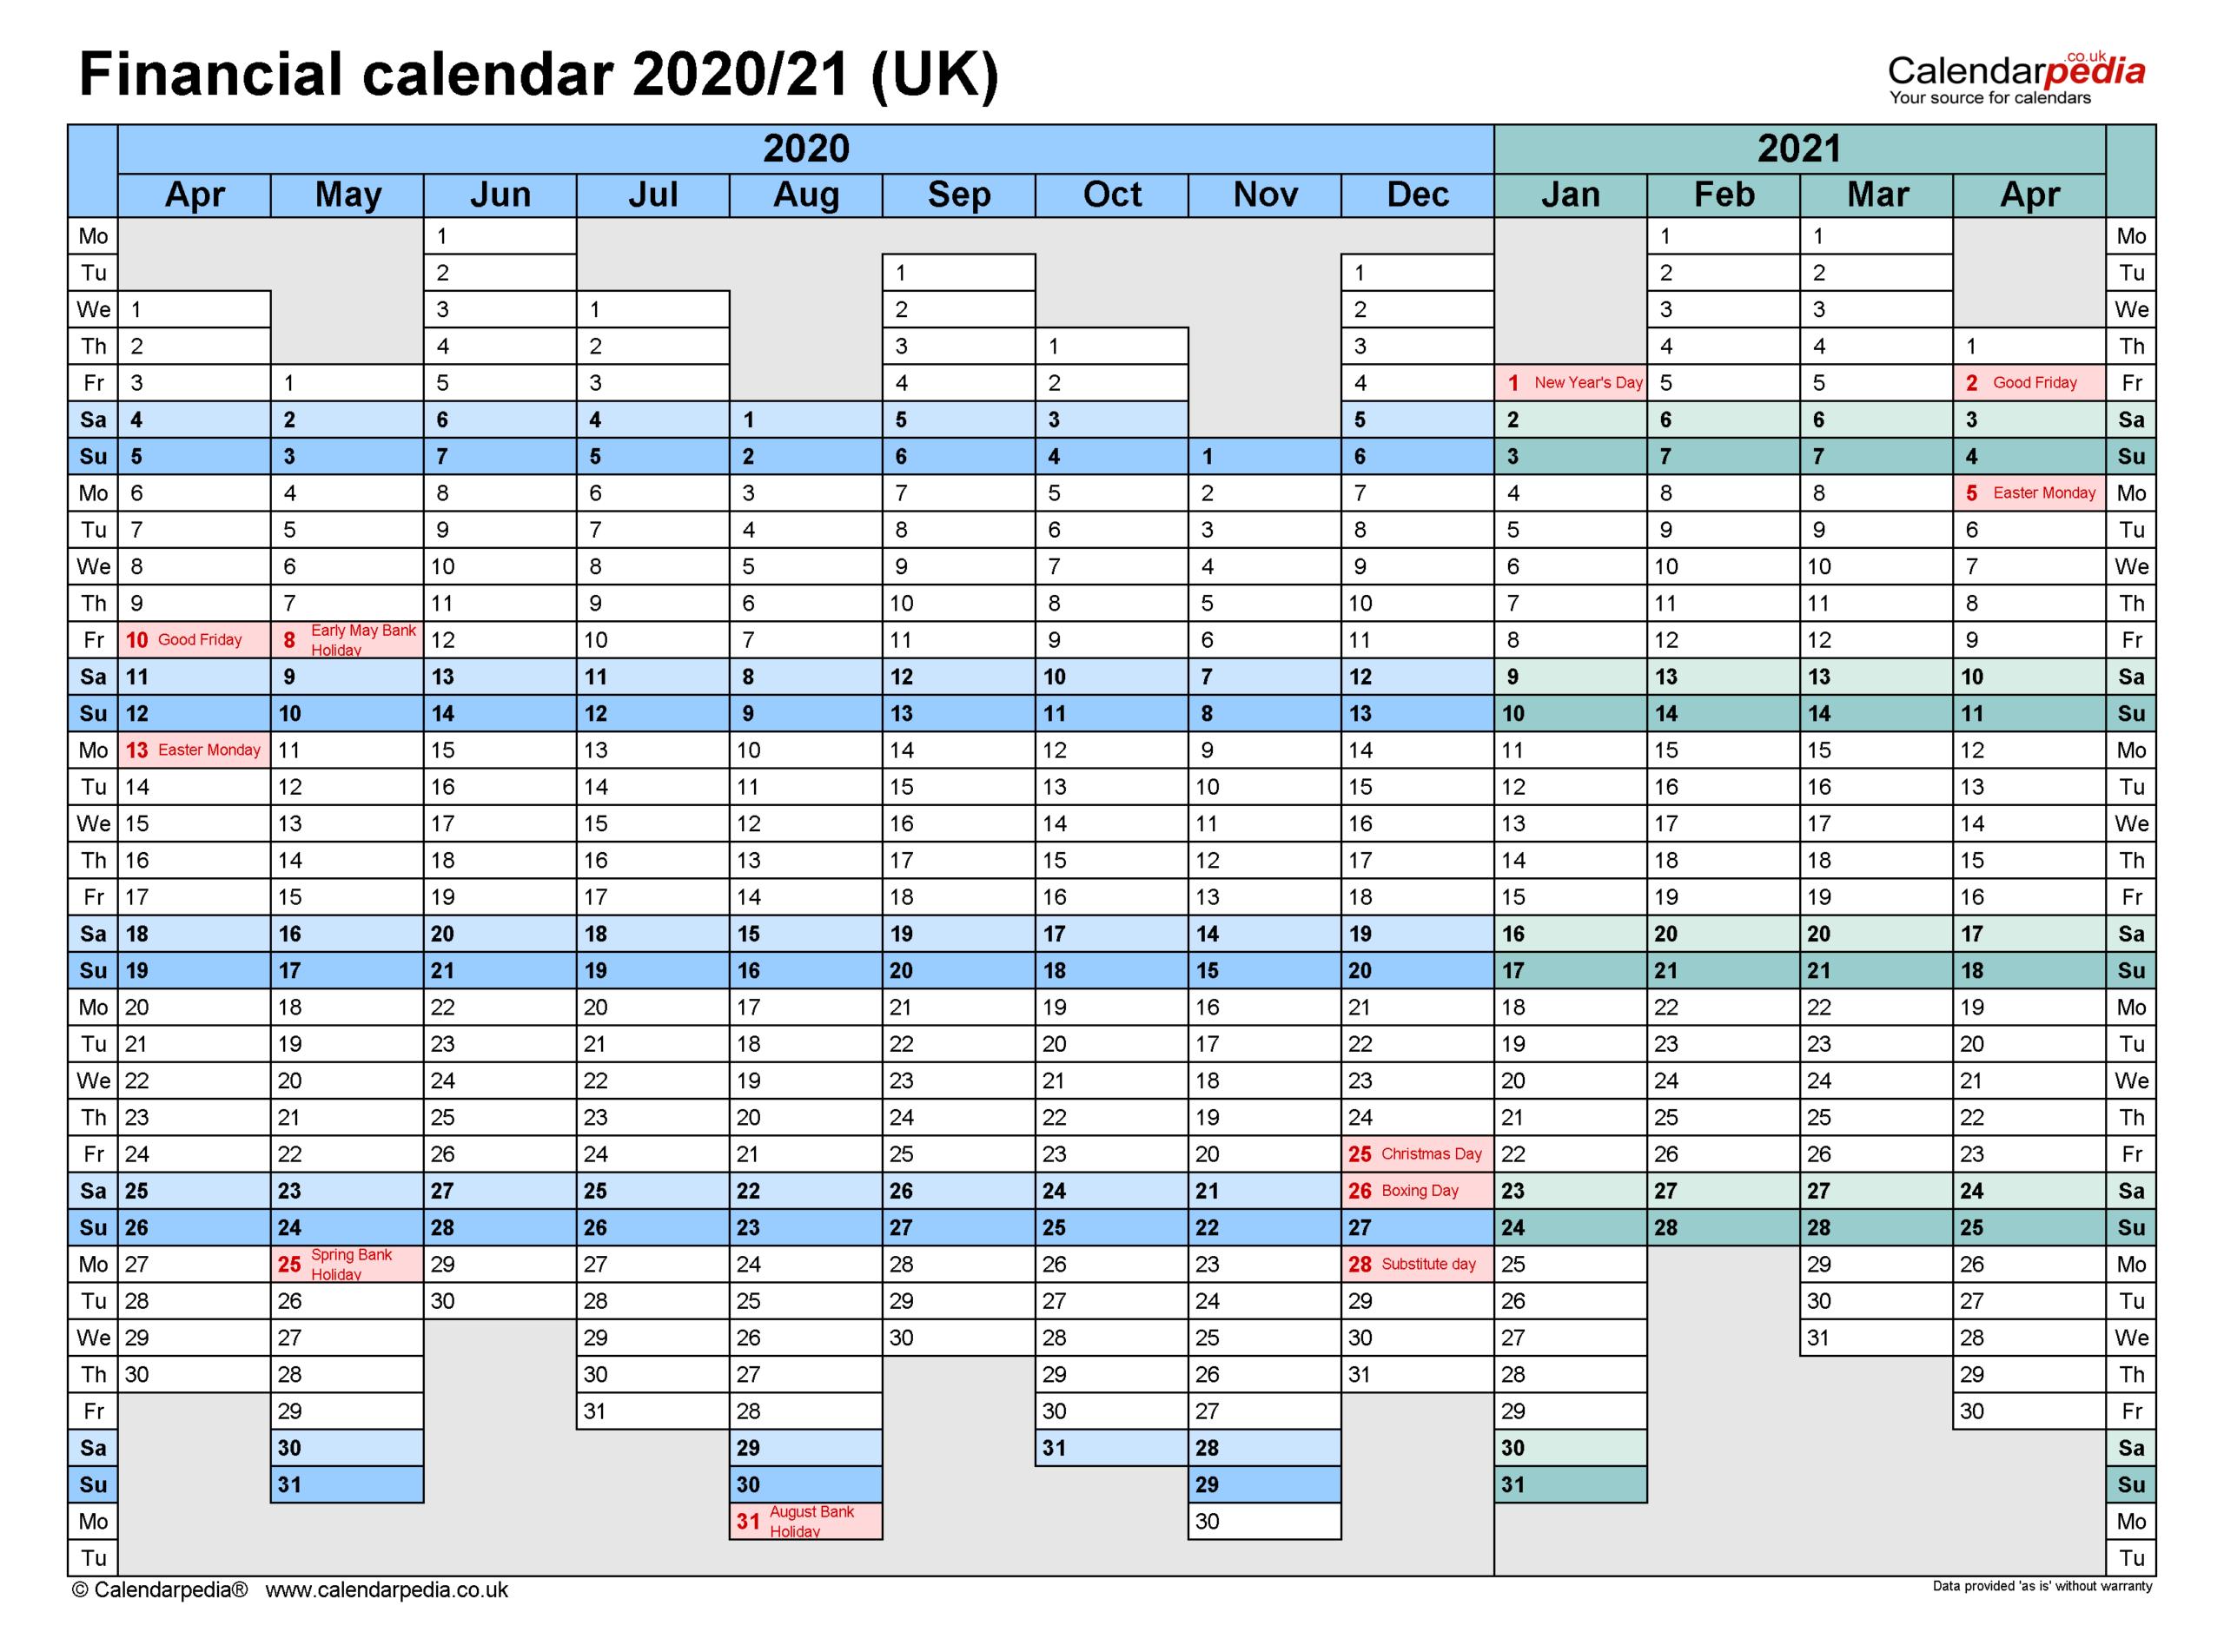 Financial Calendars 2020/21 Uk In Pdf Format